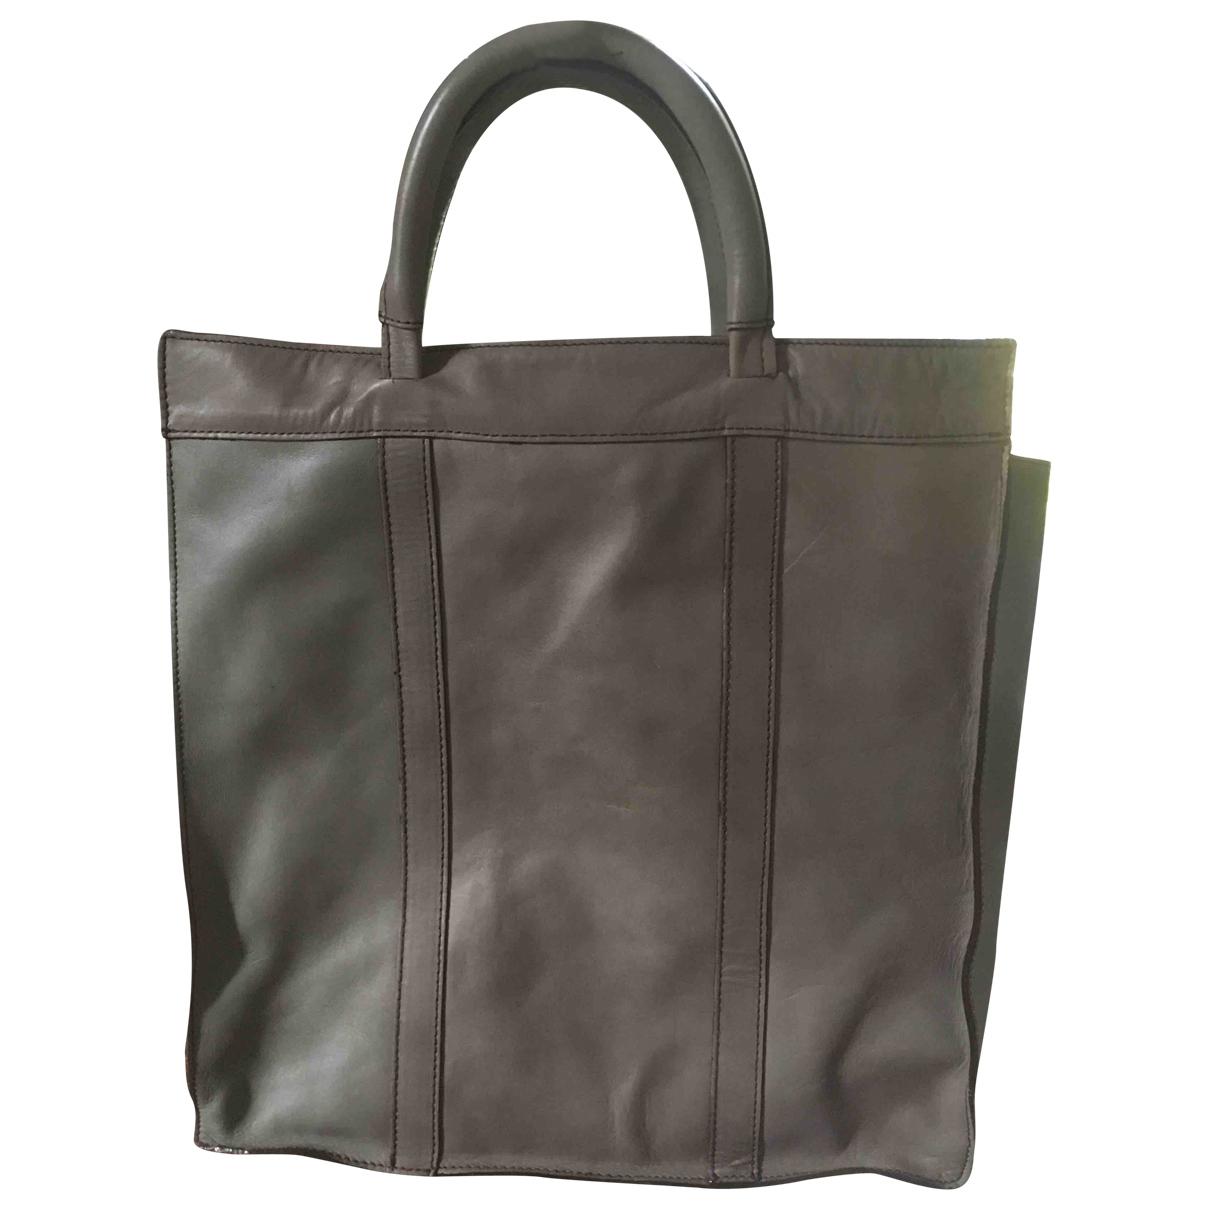 Aridza Bross \N Grey Leather handbag for Women \N